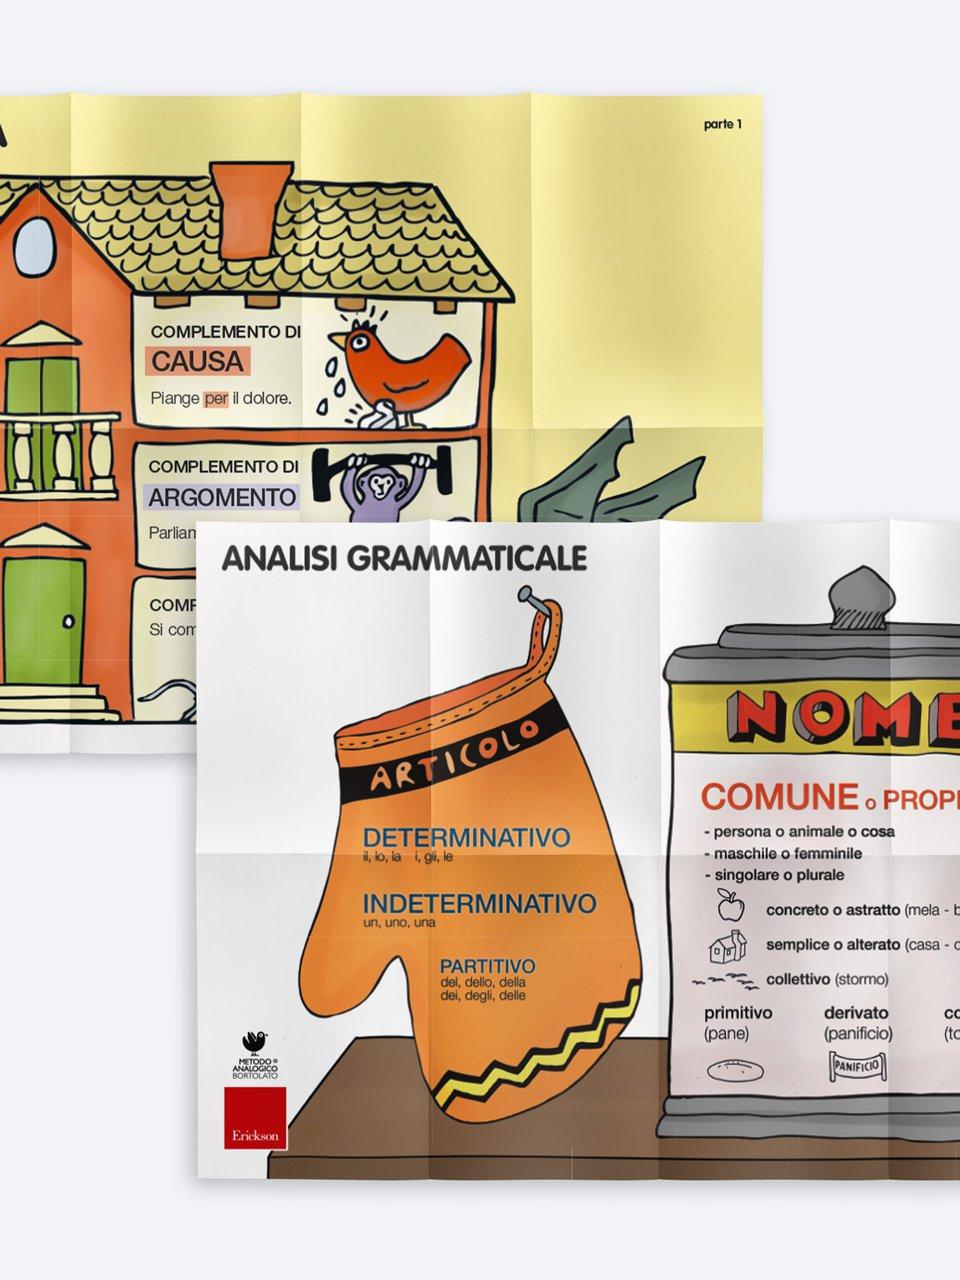 KIT Grammatica - Cartelloni murali - Metodo Analogico altre proposte - Erickson